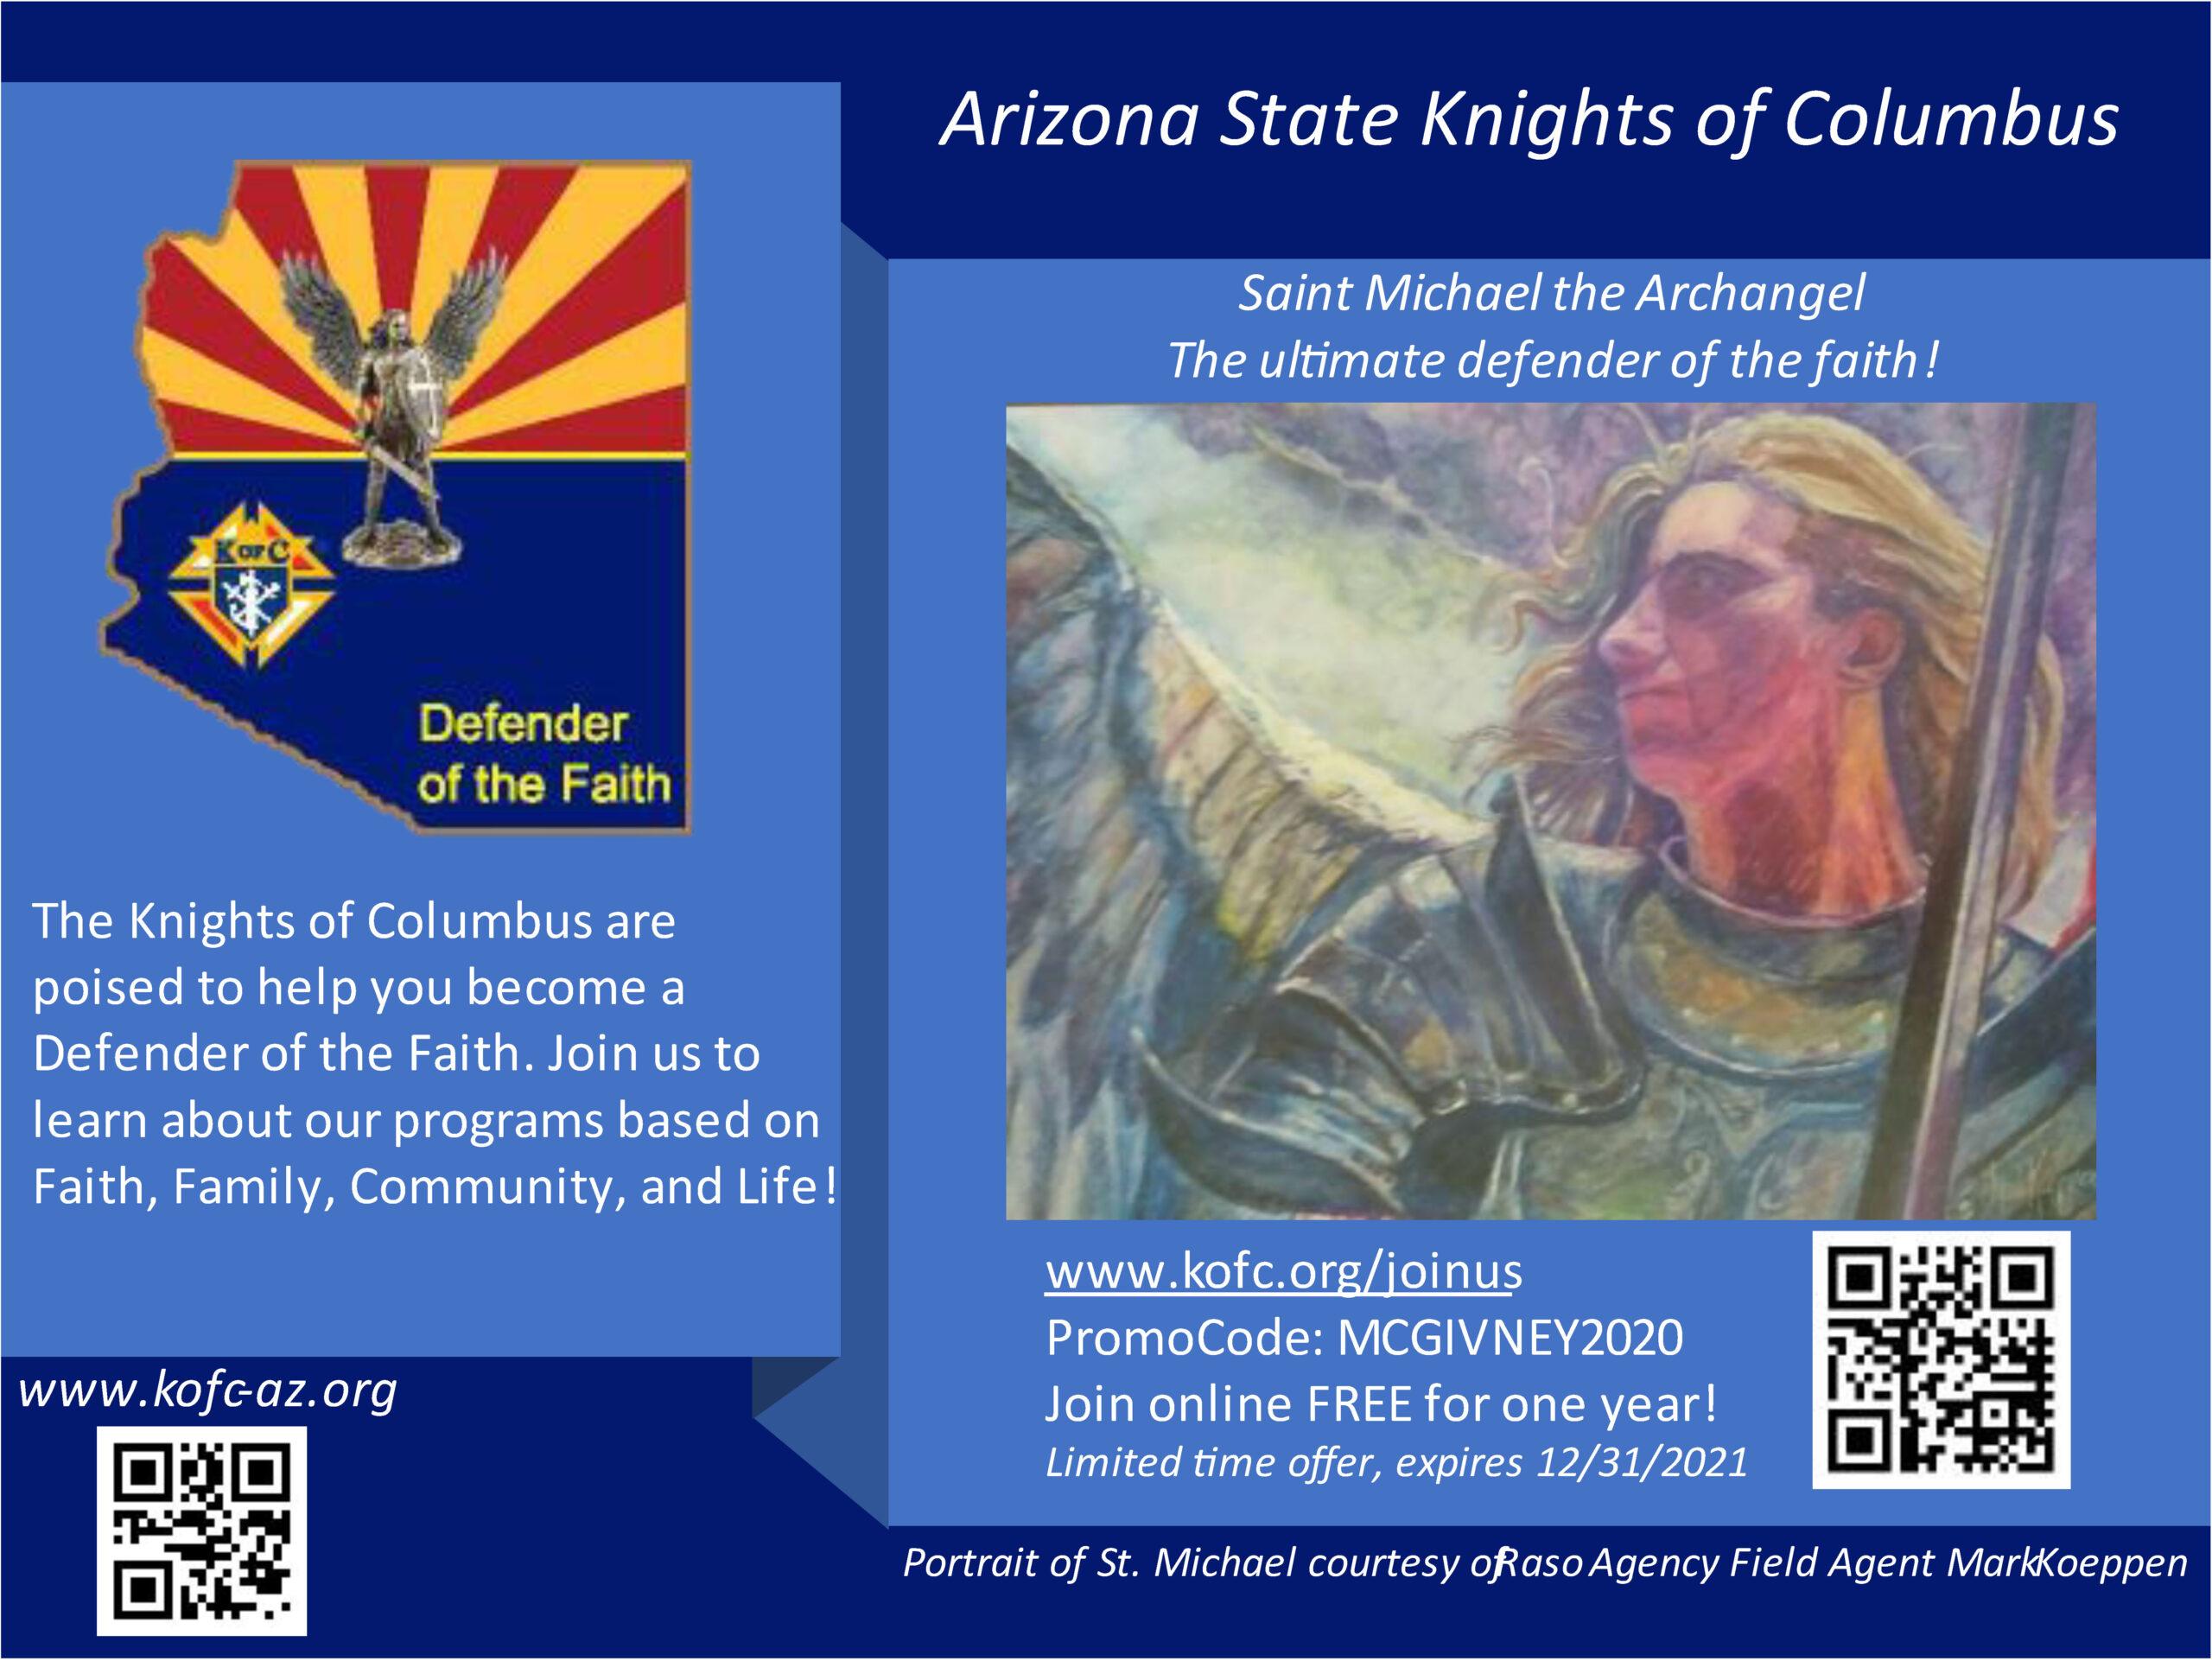 AZ Knights of Columbus September Promo